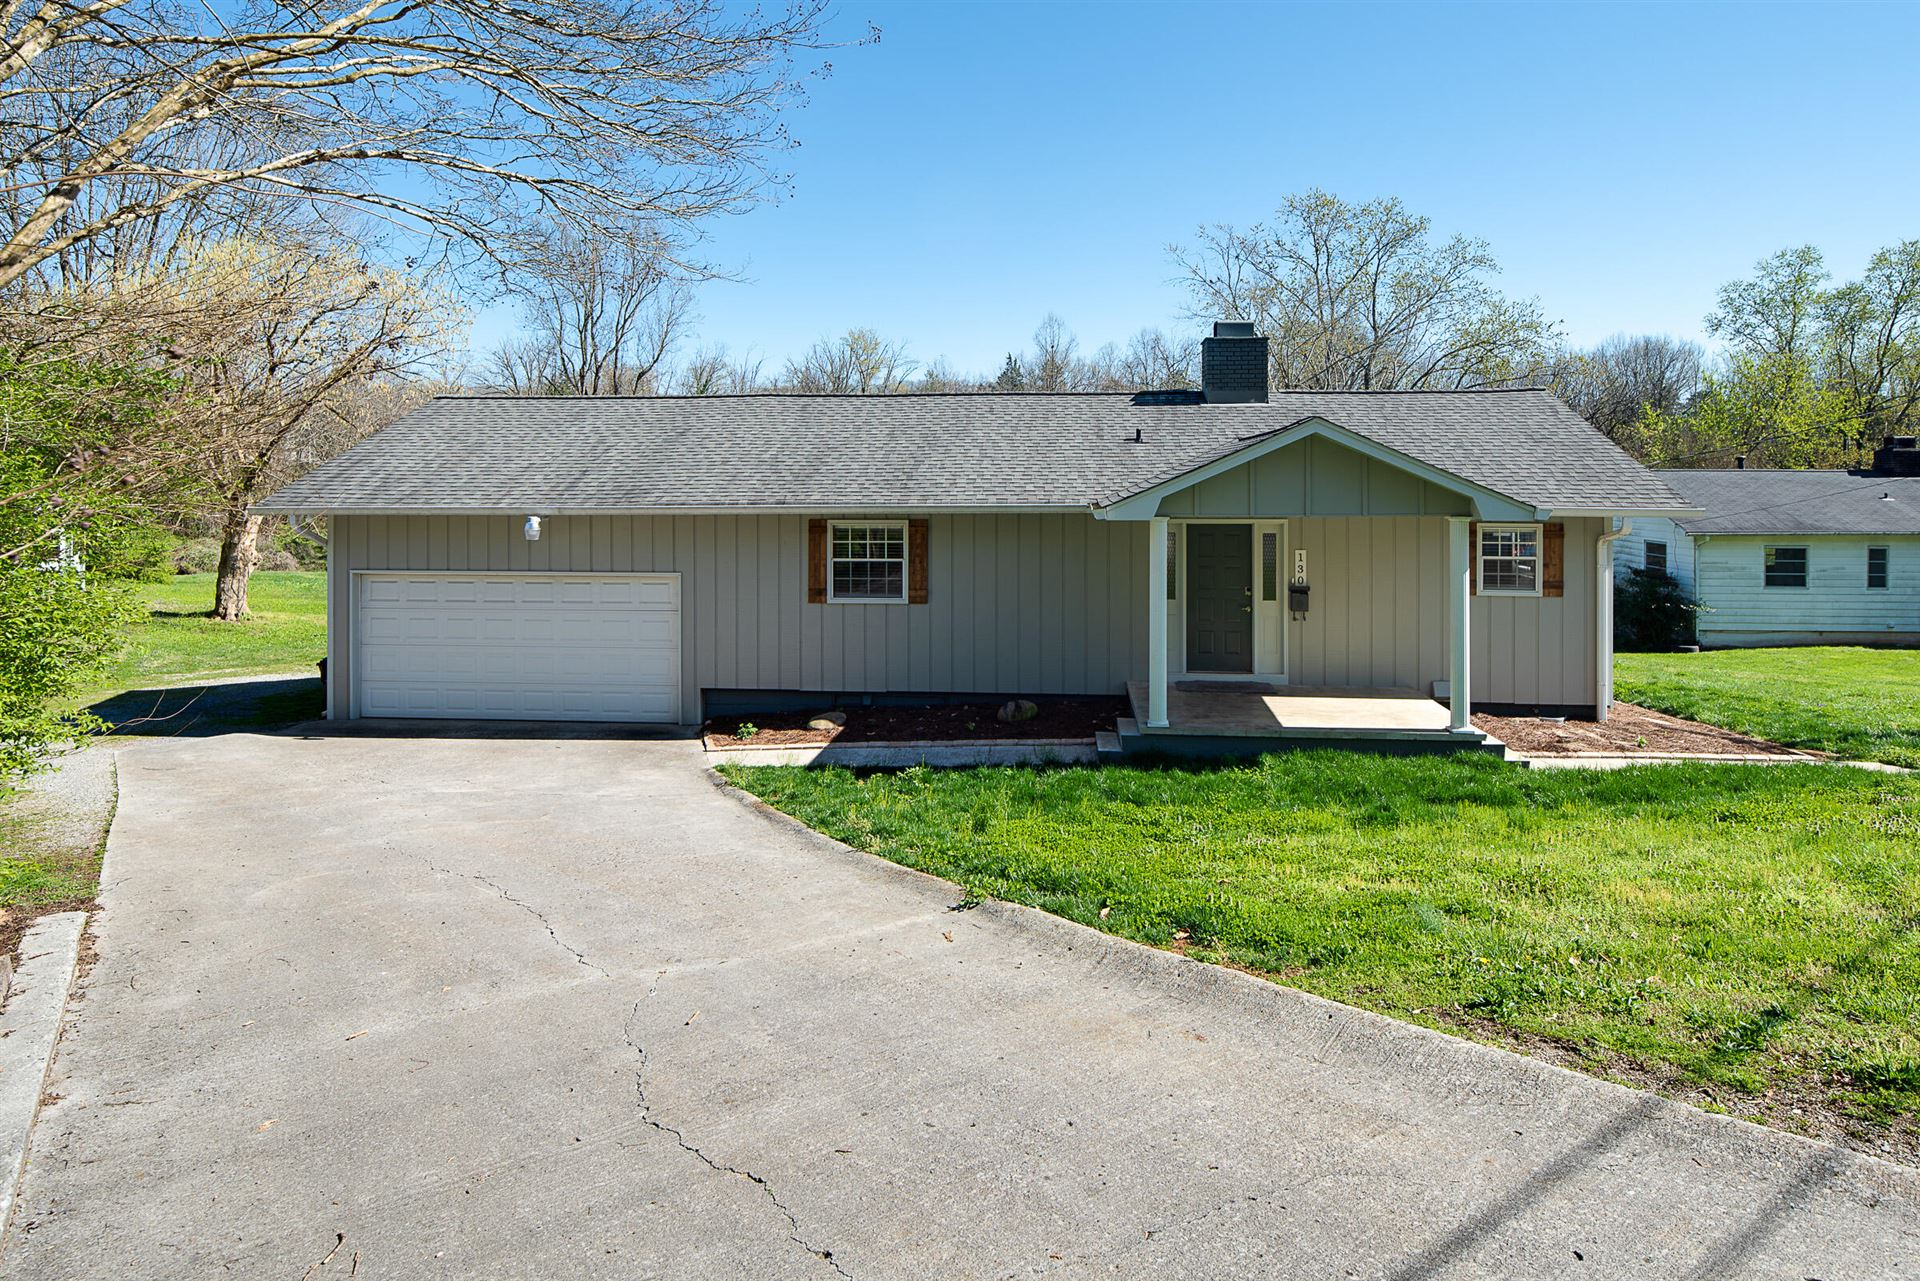 Photo of 130 California Ave, Oak Ridge, TN 37830 (MLS # 1147676)